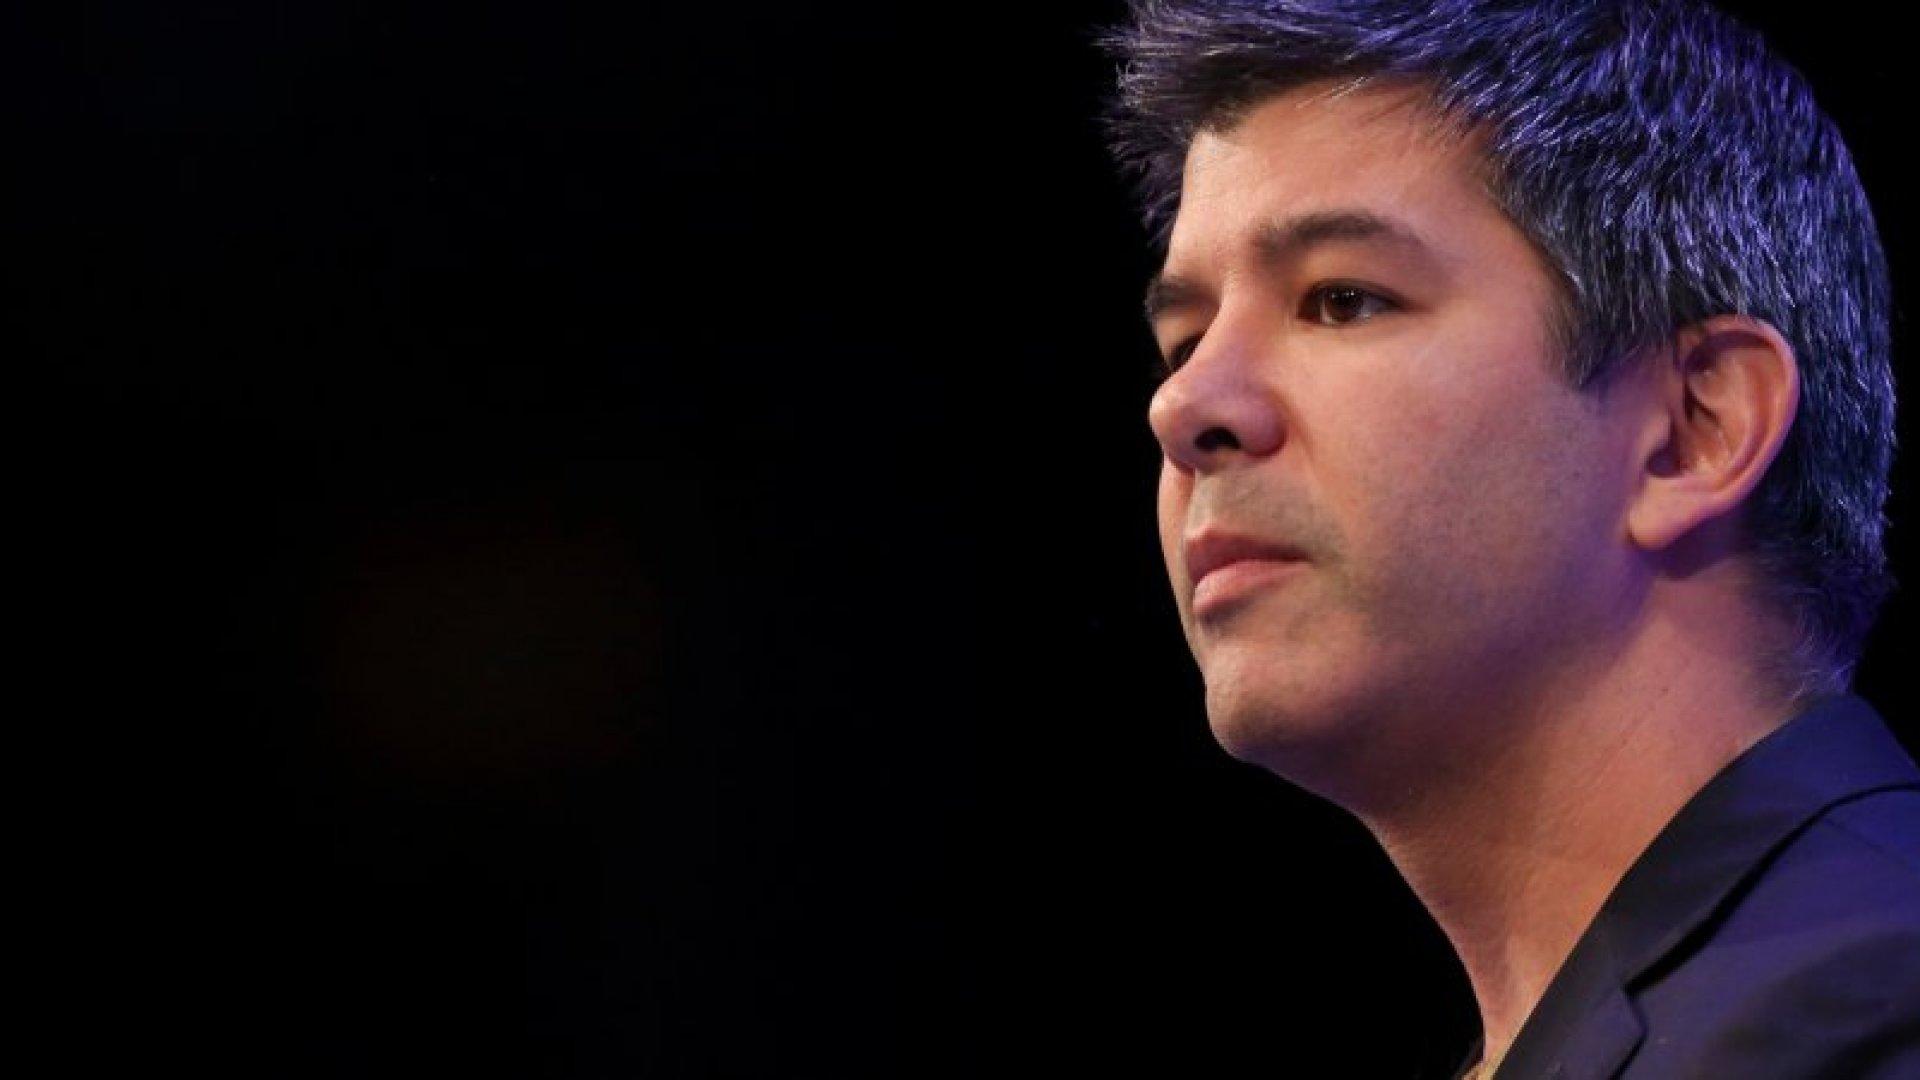 Uber CEO Travis Kalanick Admits He Tried to Sideline Lyft's Fundraising